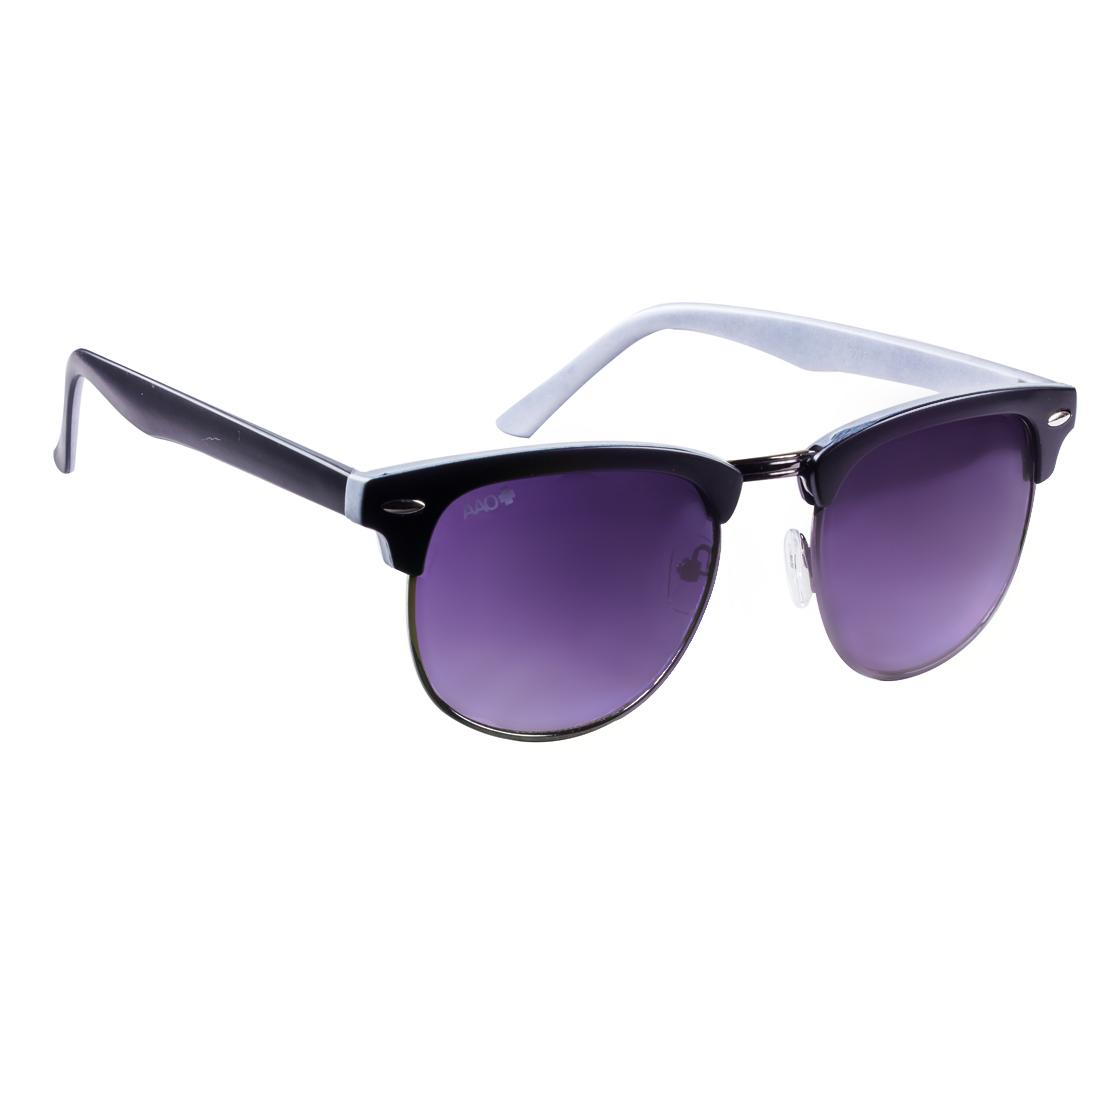 AAO+ Sunglasses